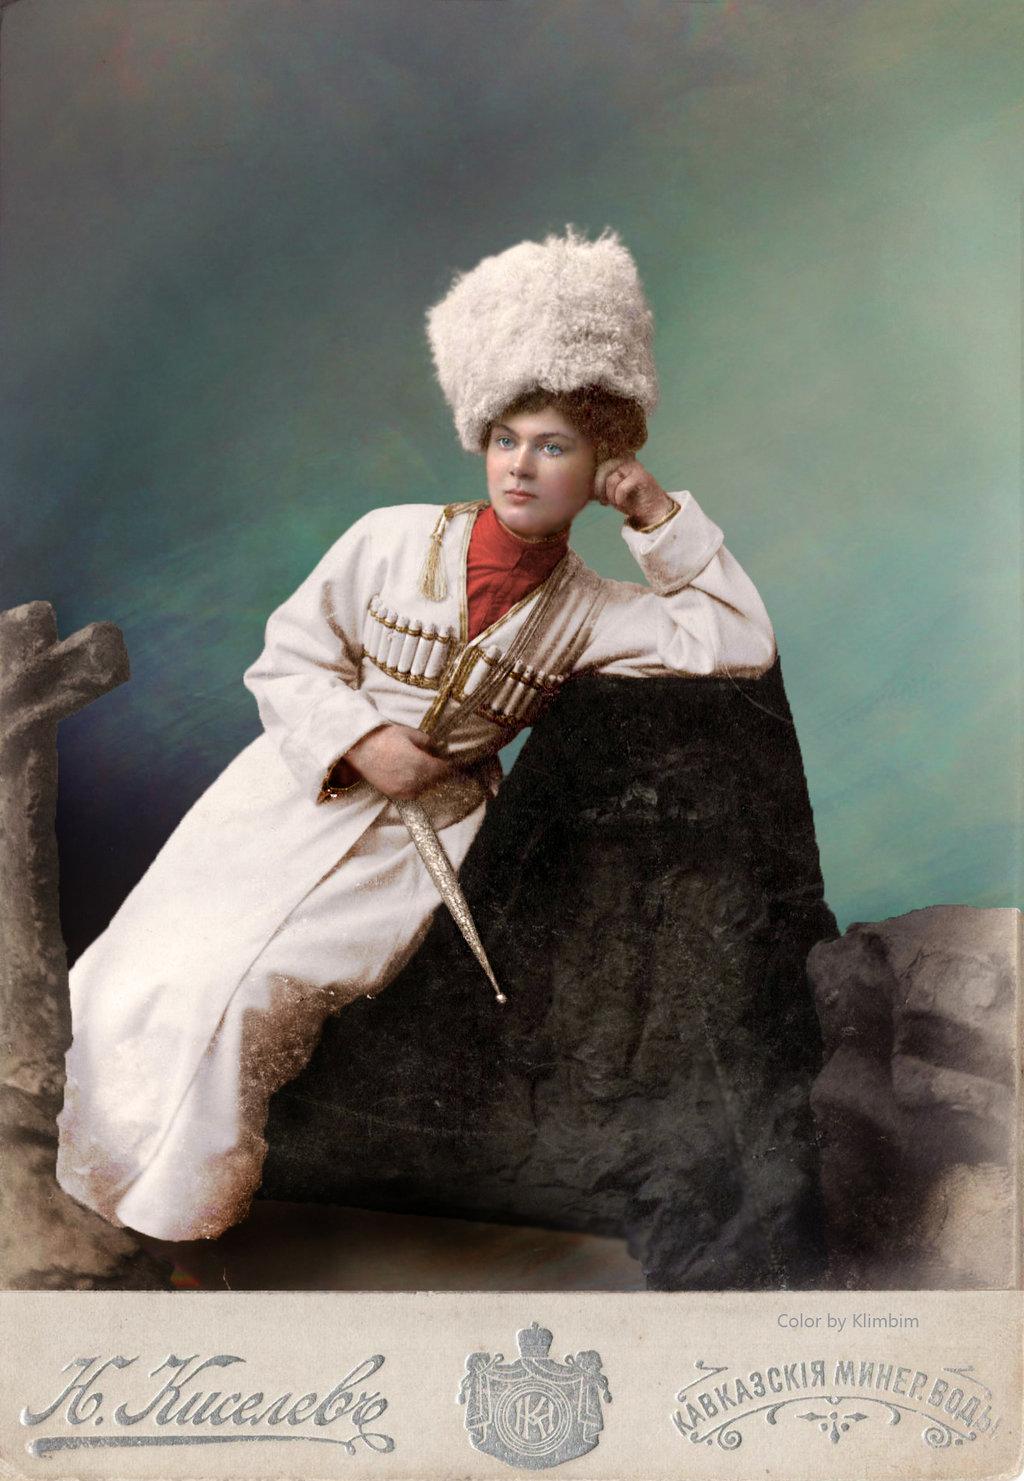 a_commemorative_photo_from_caucasian_spas_by_klimbims-d8pop8o.jpg